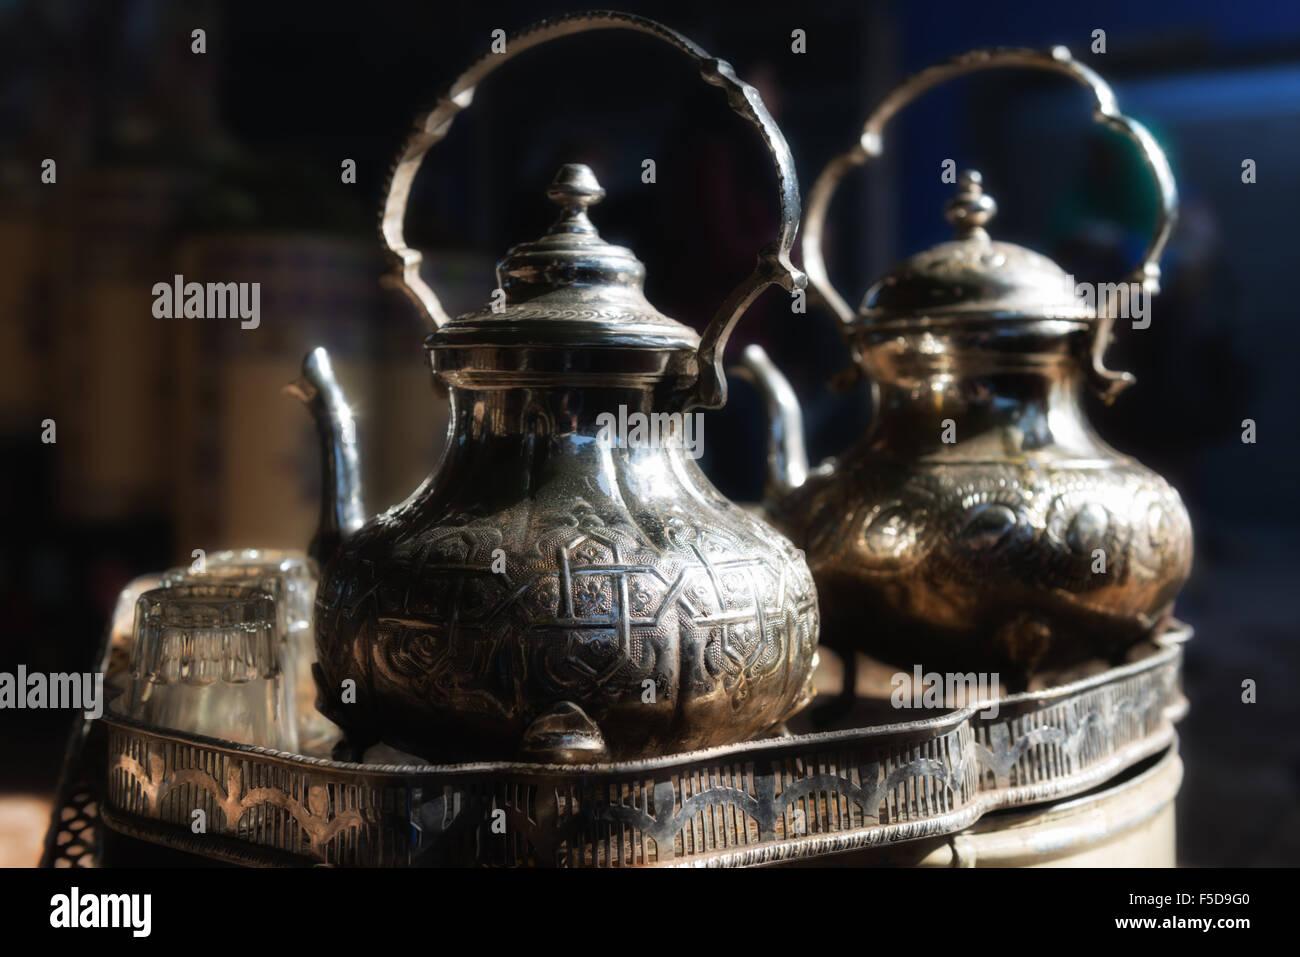 Tetera marroquí tradicional con vasos en una bandeja de té de la Medina de Marrakech, Marruecos. Imagen De Stock